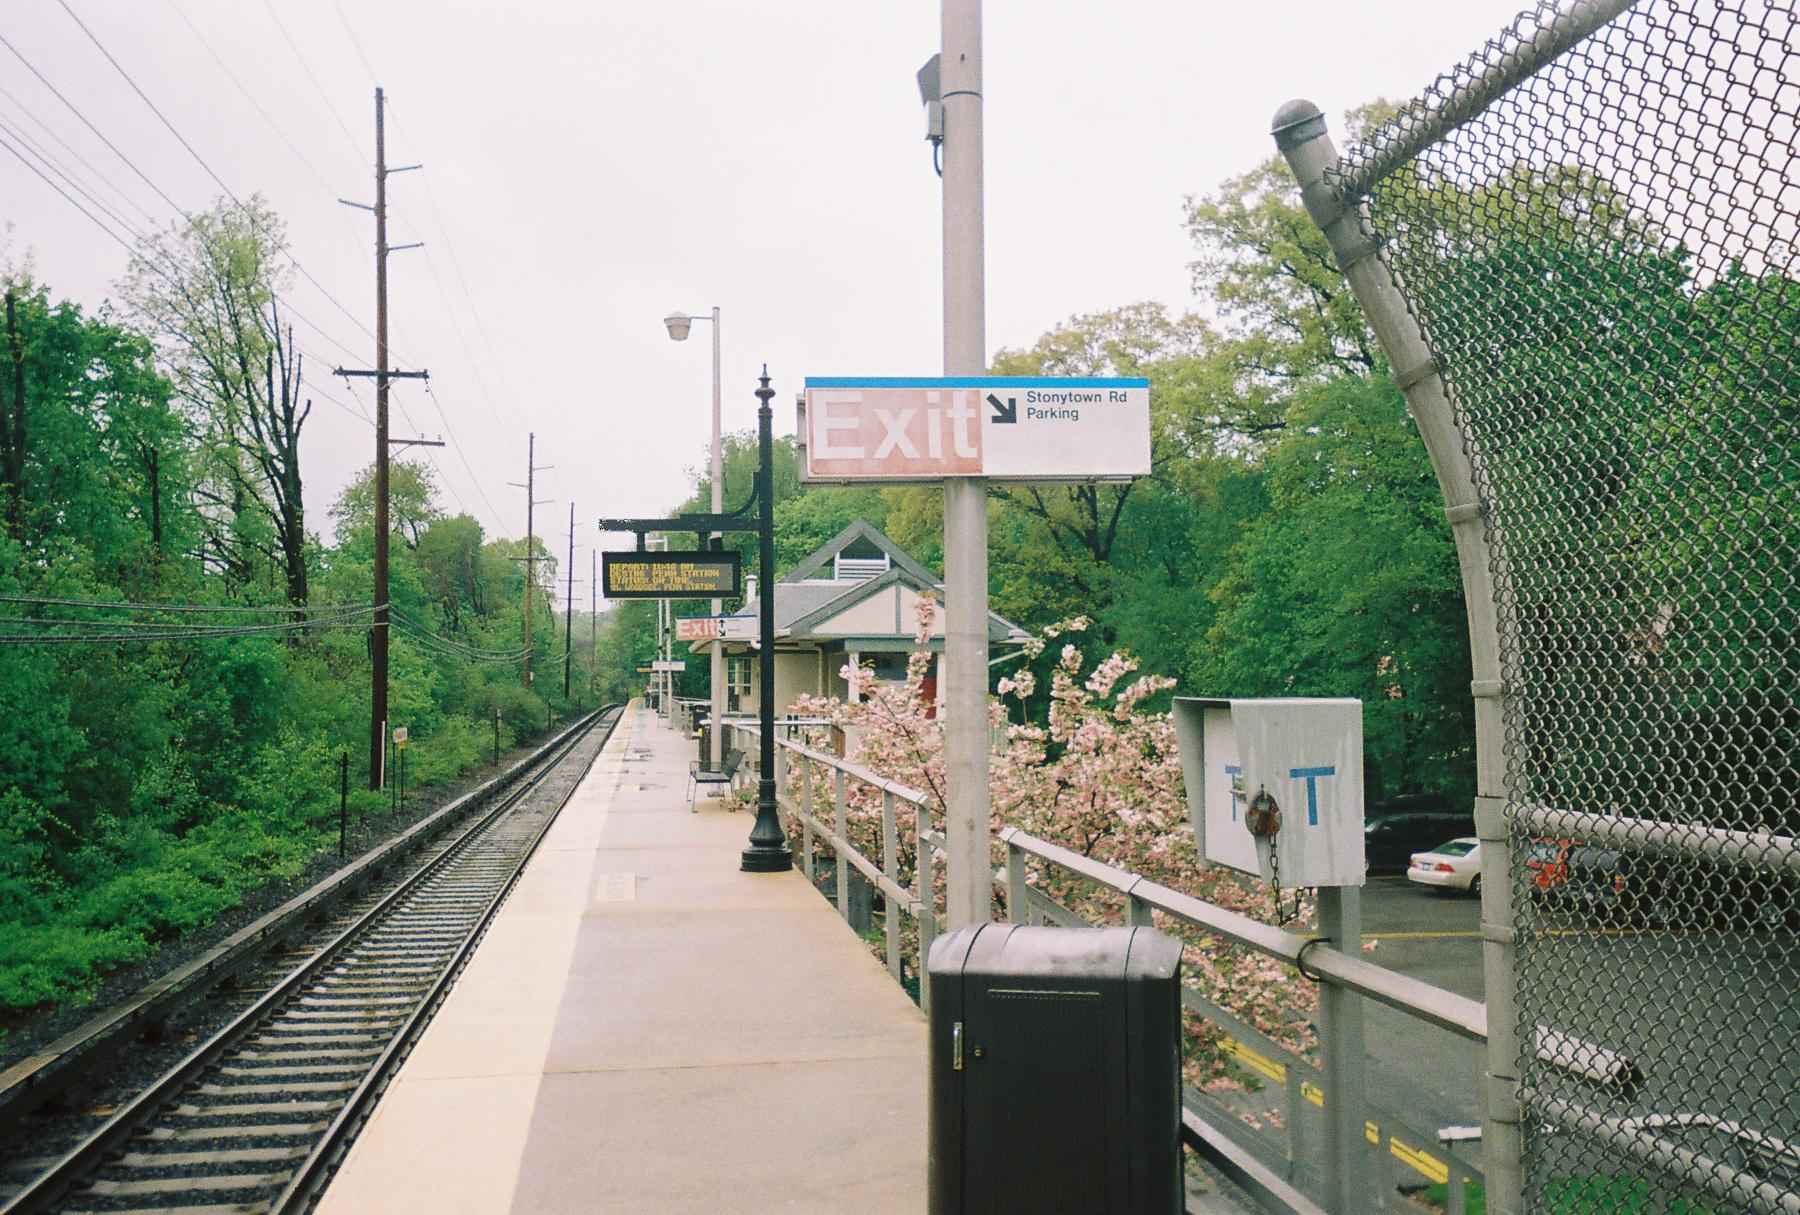 Plandome (LIRR station)